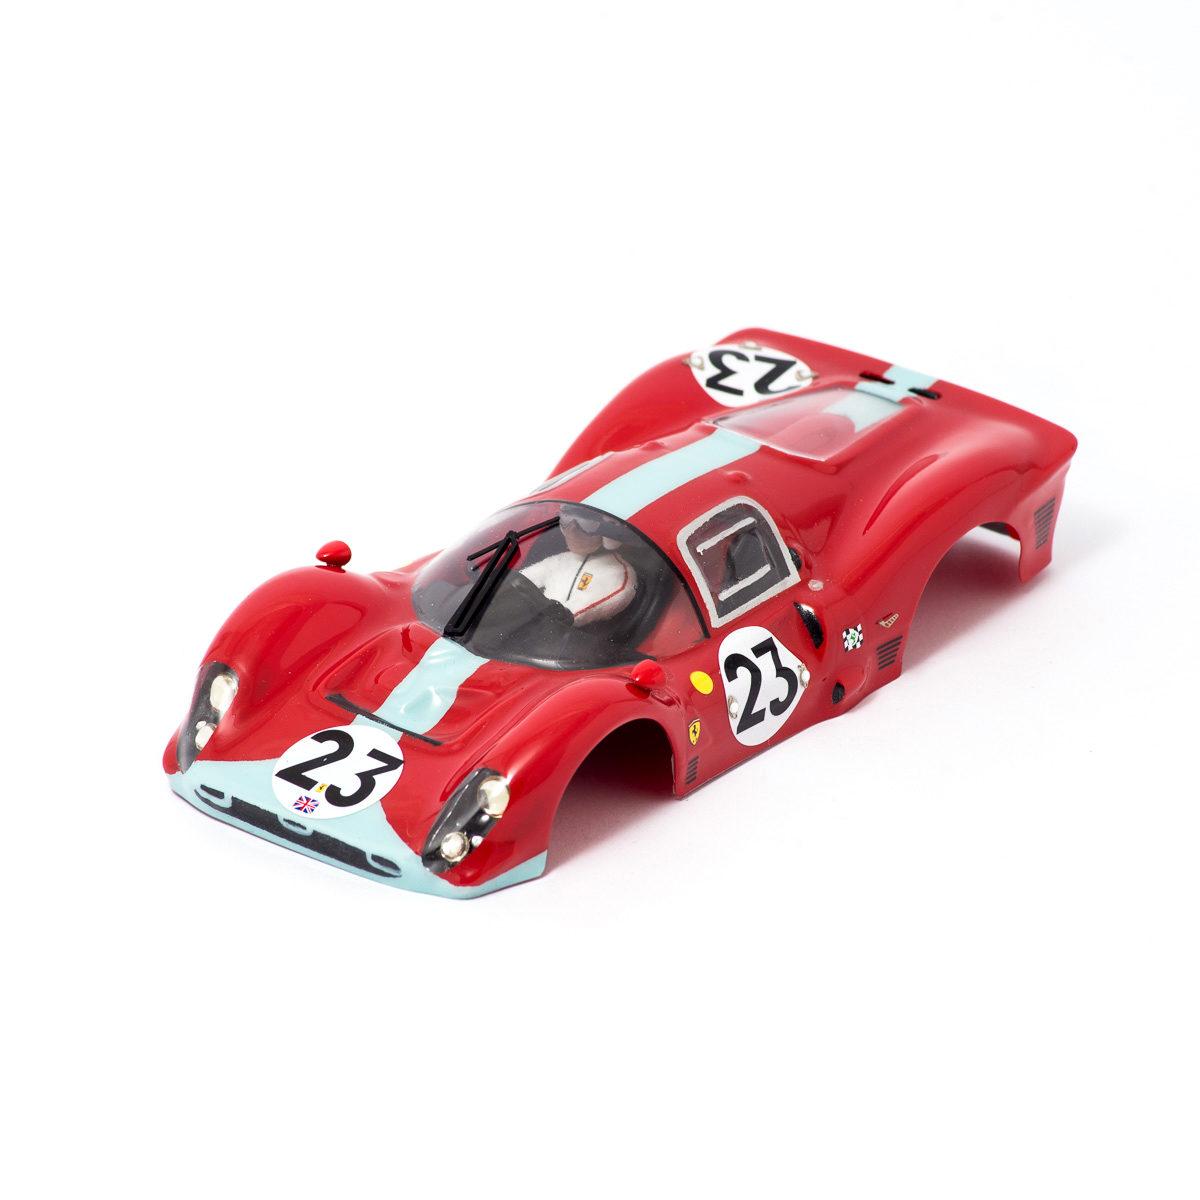 Carrozzeria Slot Car Ferrari 412P 1967 1/24 Maranello Concessionaires